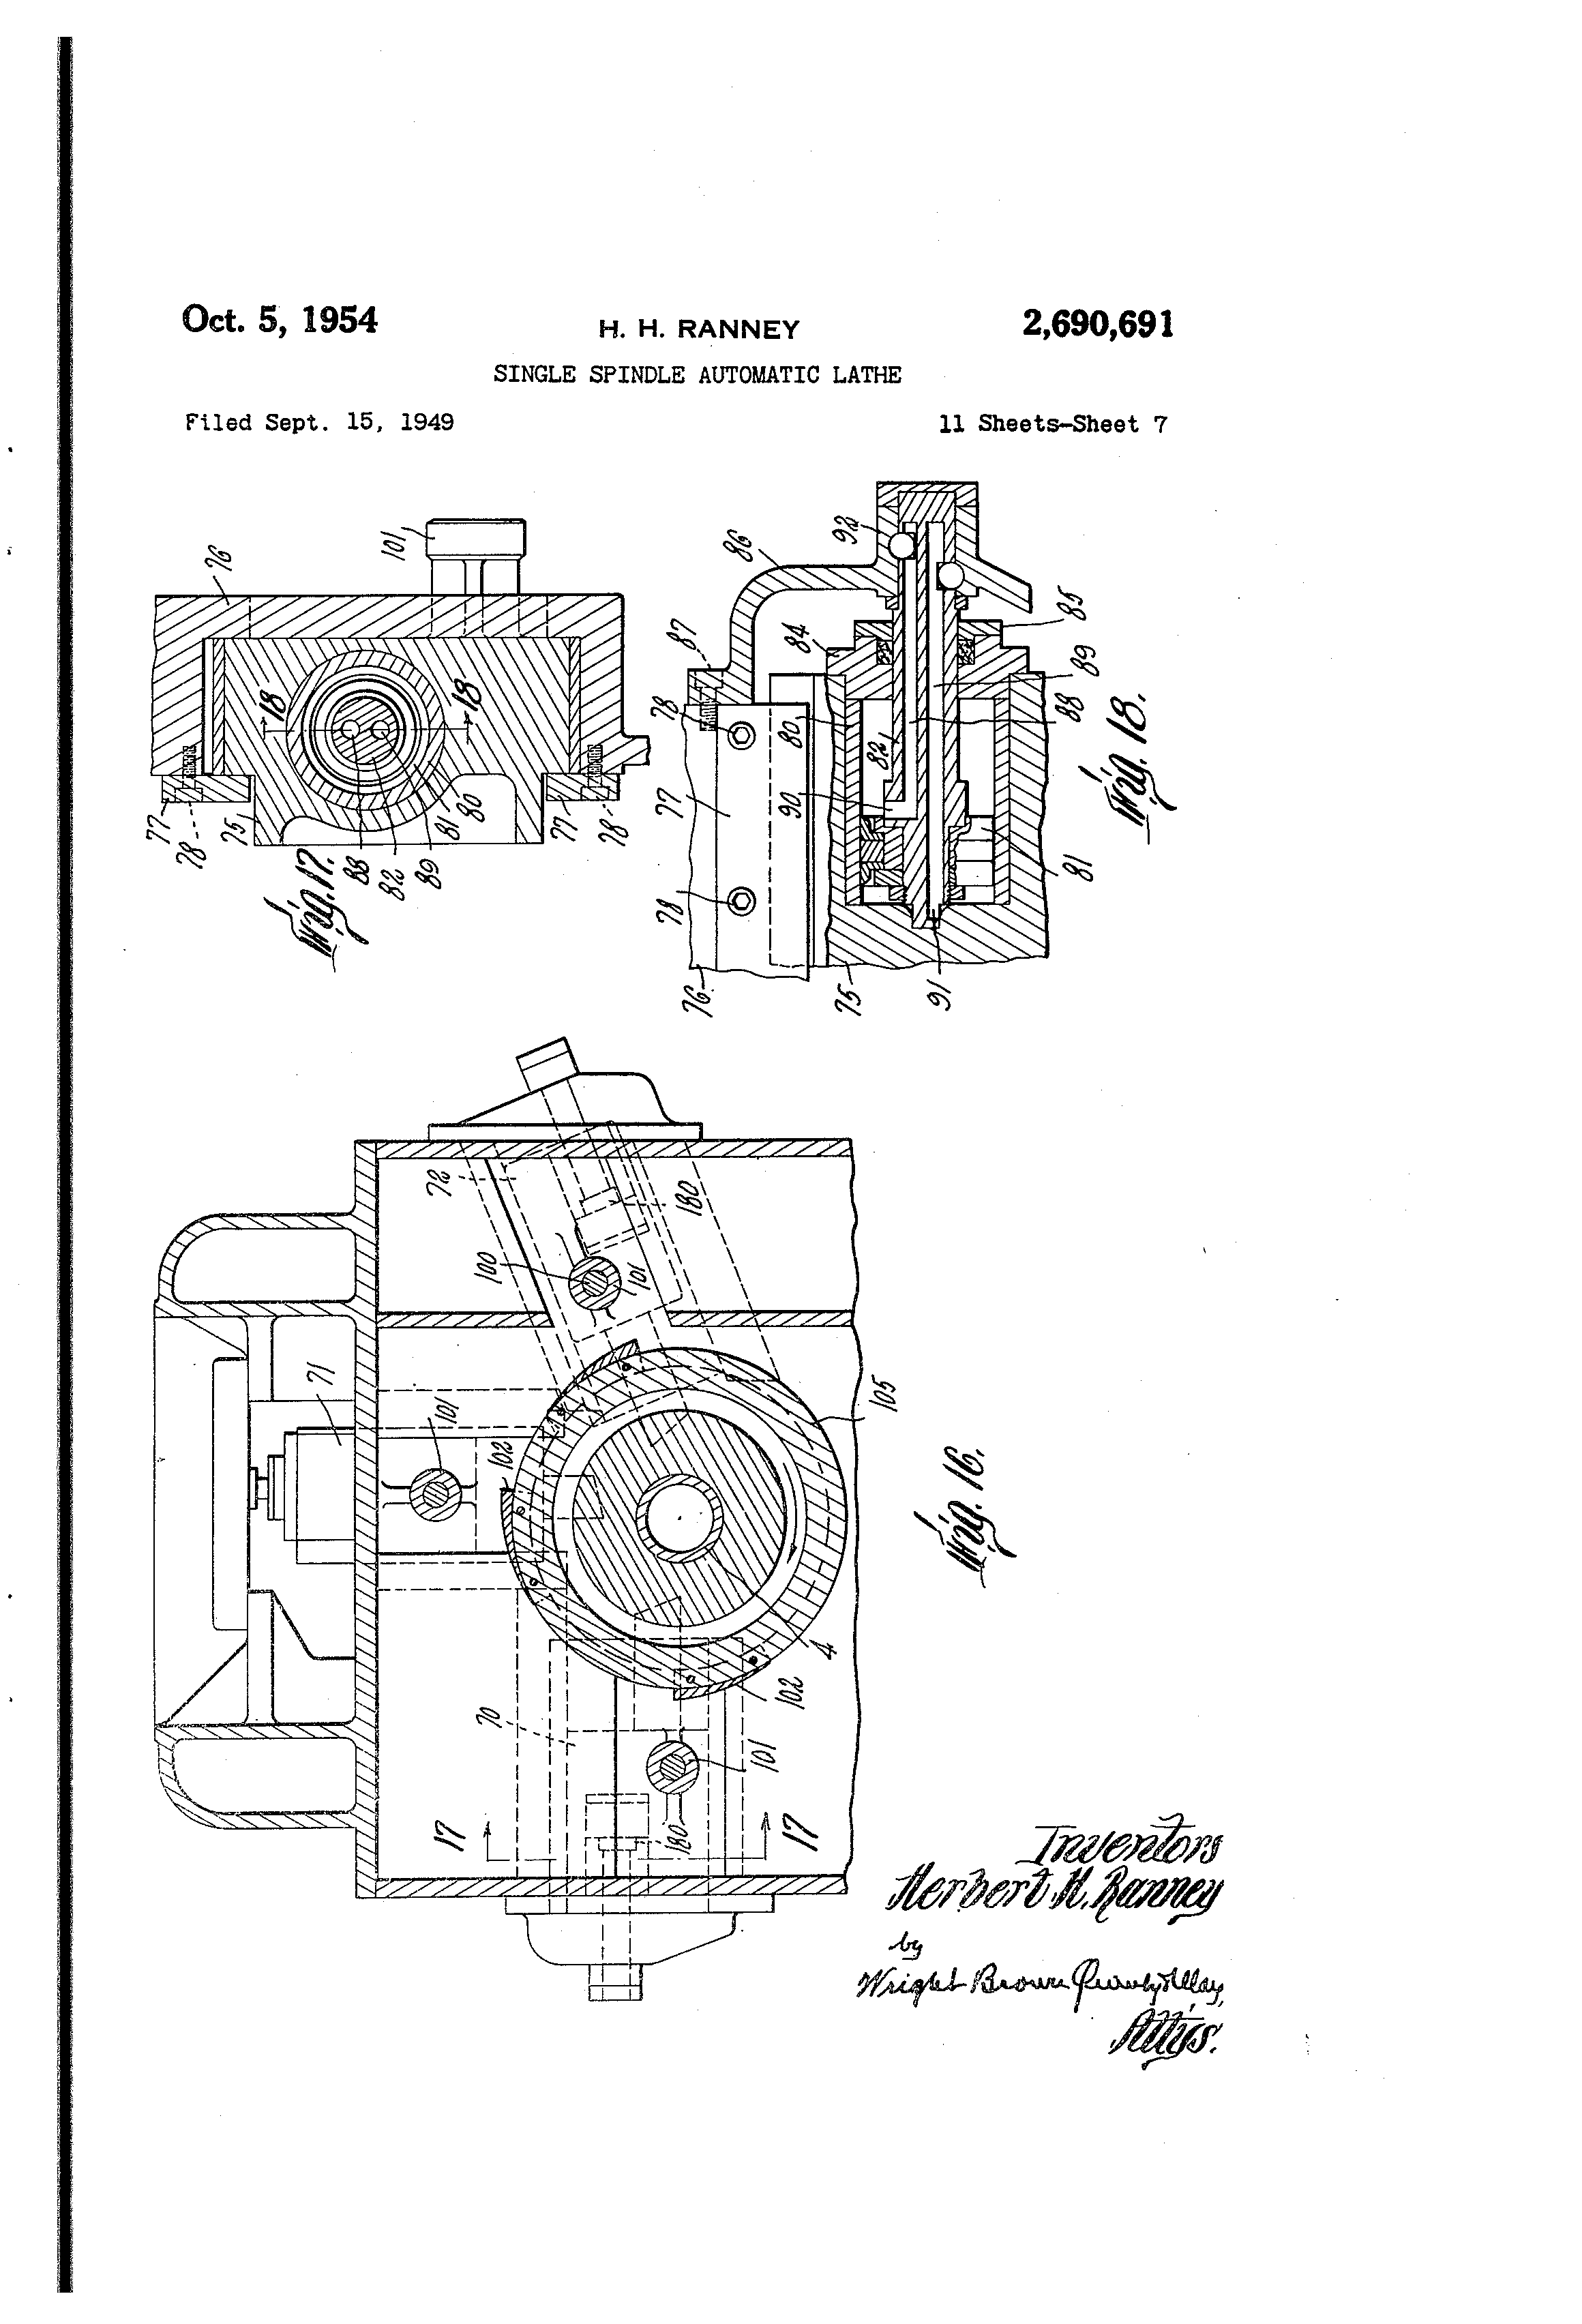 single spindle automatic lathe pdf